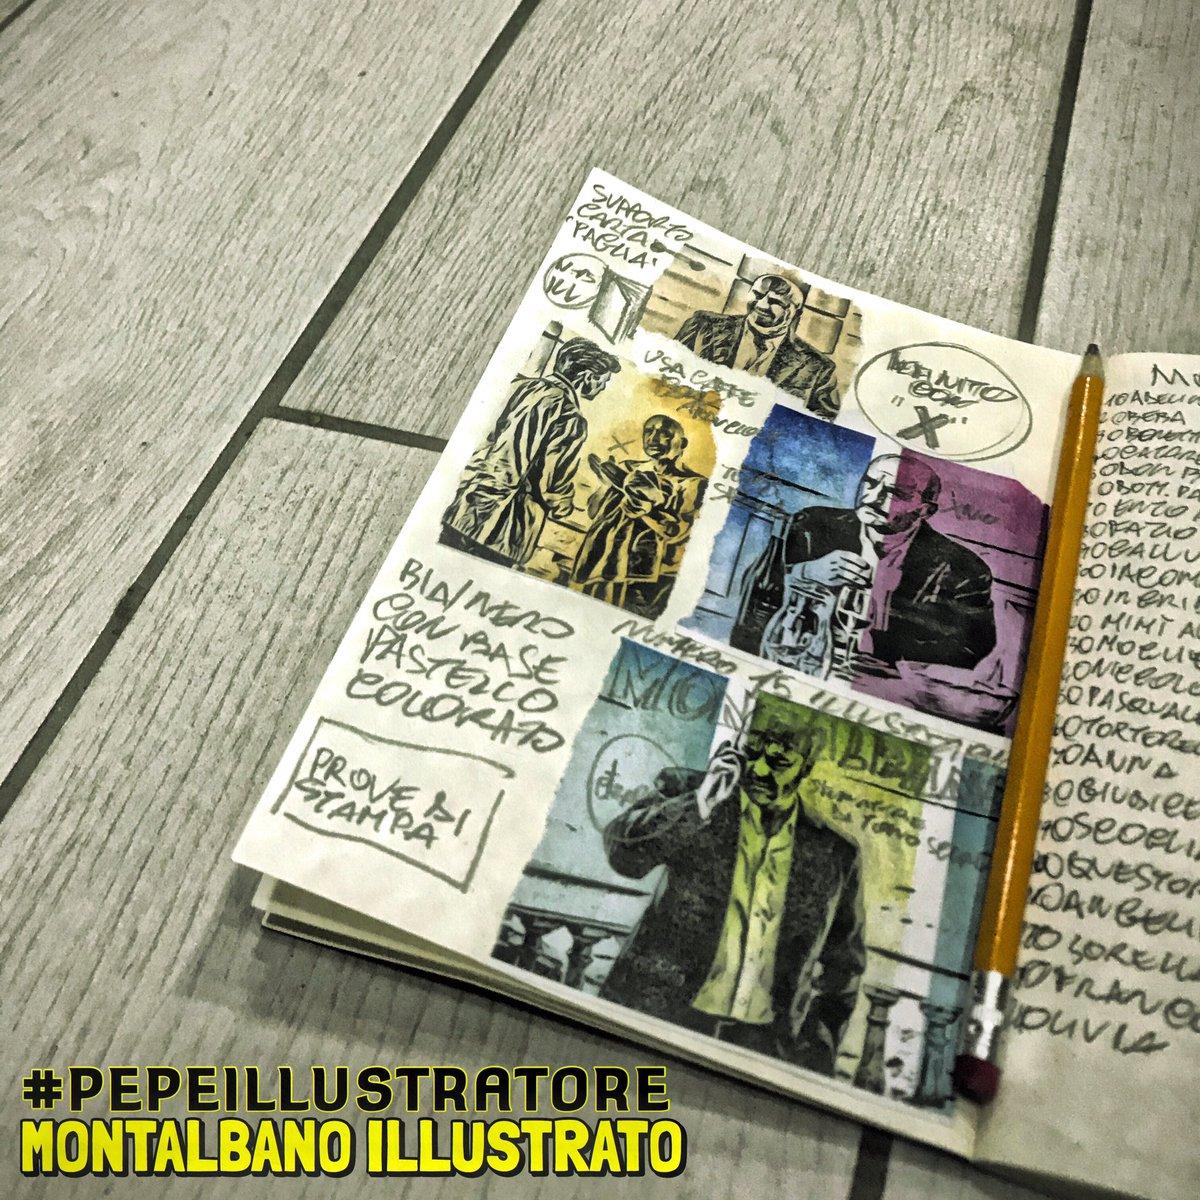 🤎MONTALBANO ILLUSTRATO 🤎 #montalbanoillustrato 📚Sketchbook Illustrations📝📚 Collection 🚔🚨📔📔📔📔📔📔 #montalbano #ilcommissariomontalbano #pepe #sicilia #colore #sellerio #zingaretti #commissario #tshirt #logo #fiction #cool  #polizia #love  #soniabergamasco